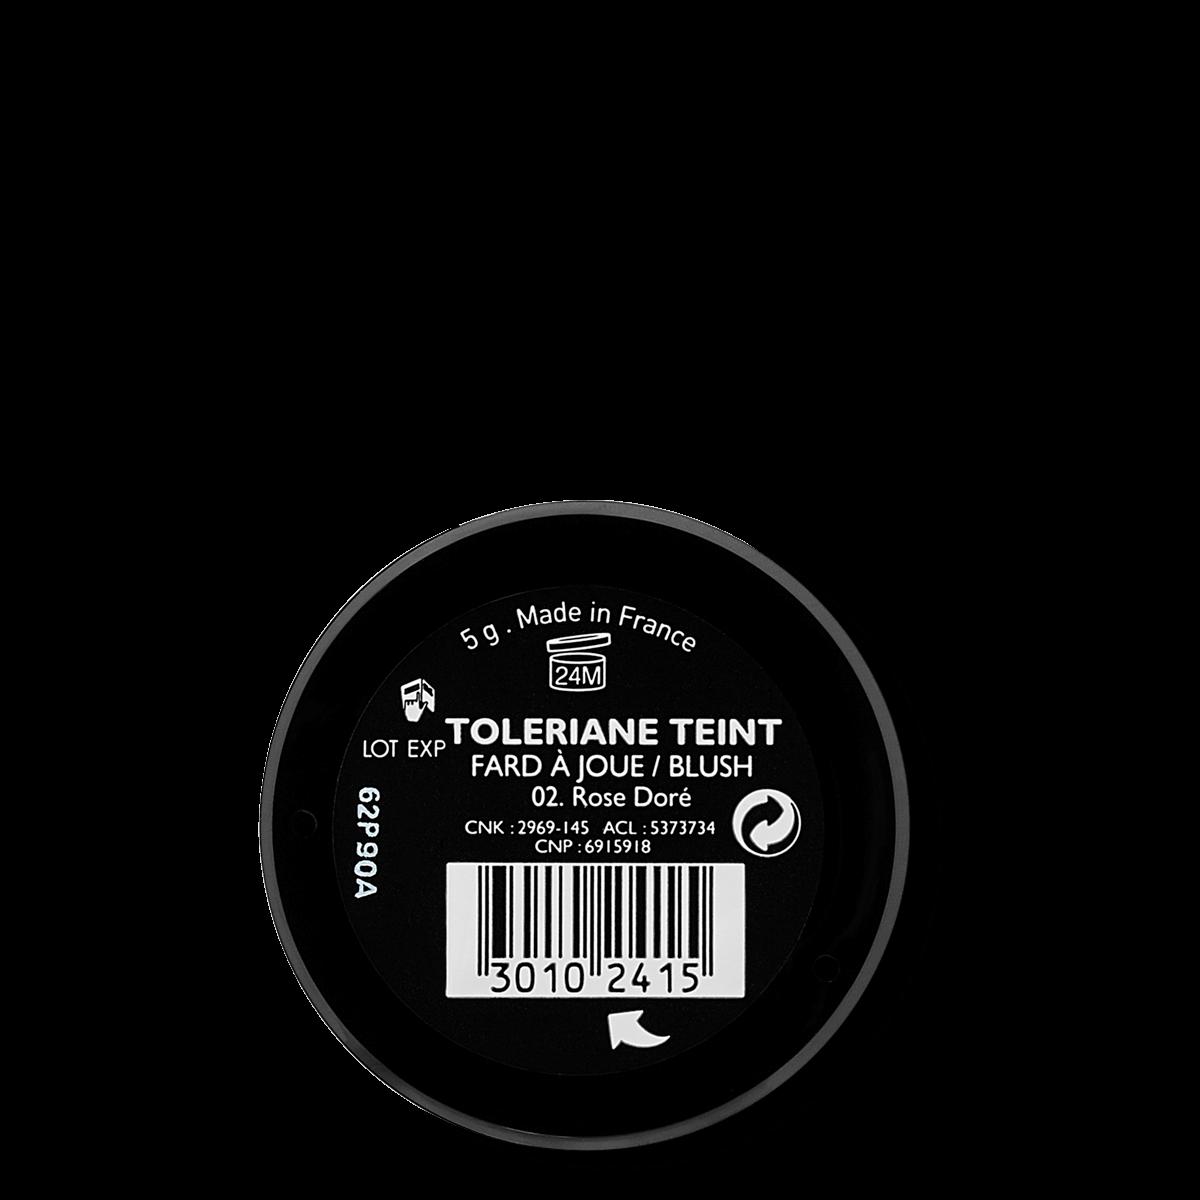 La Roche Posay Sensitive Toleriane Make up BLUSH GoldenPink 30102415 B